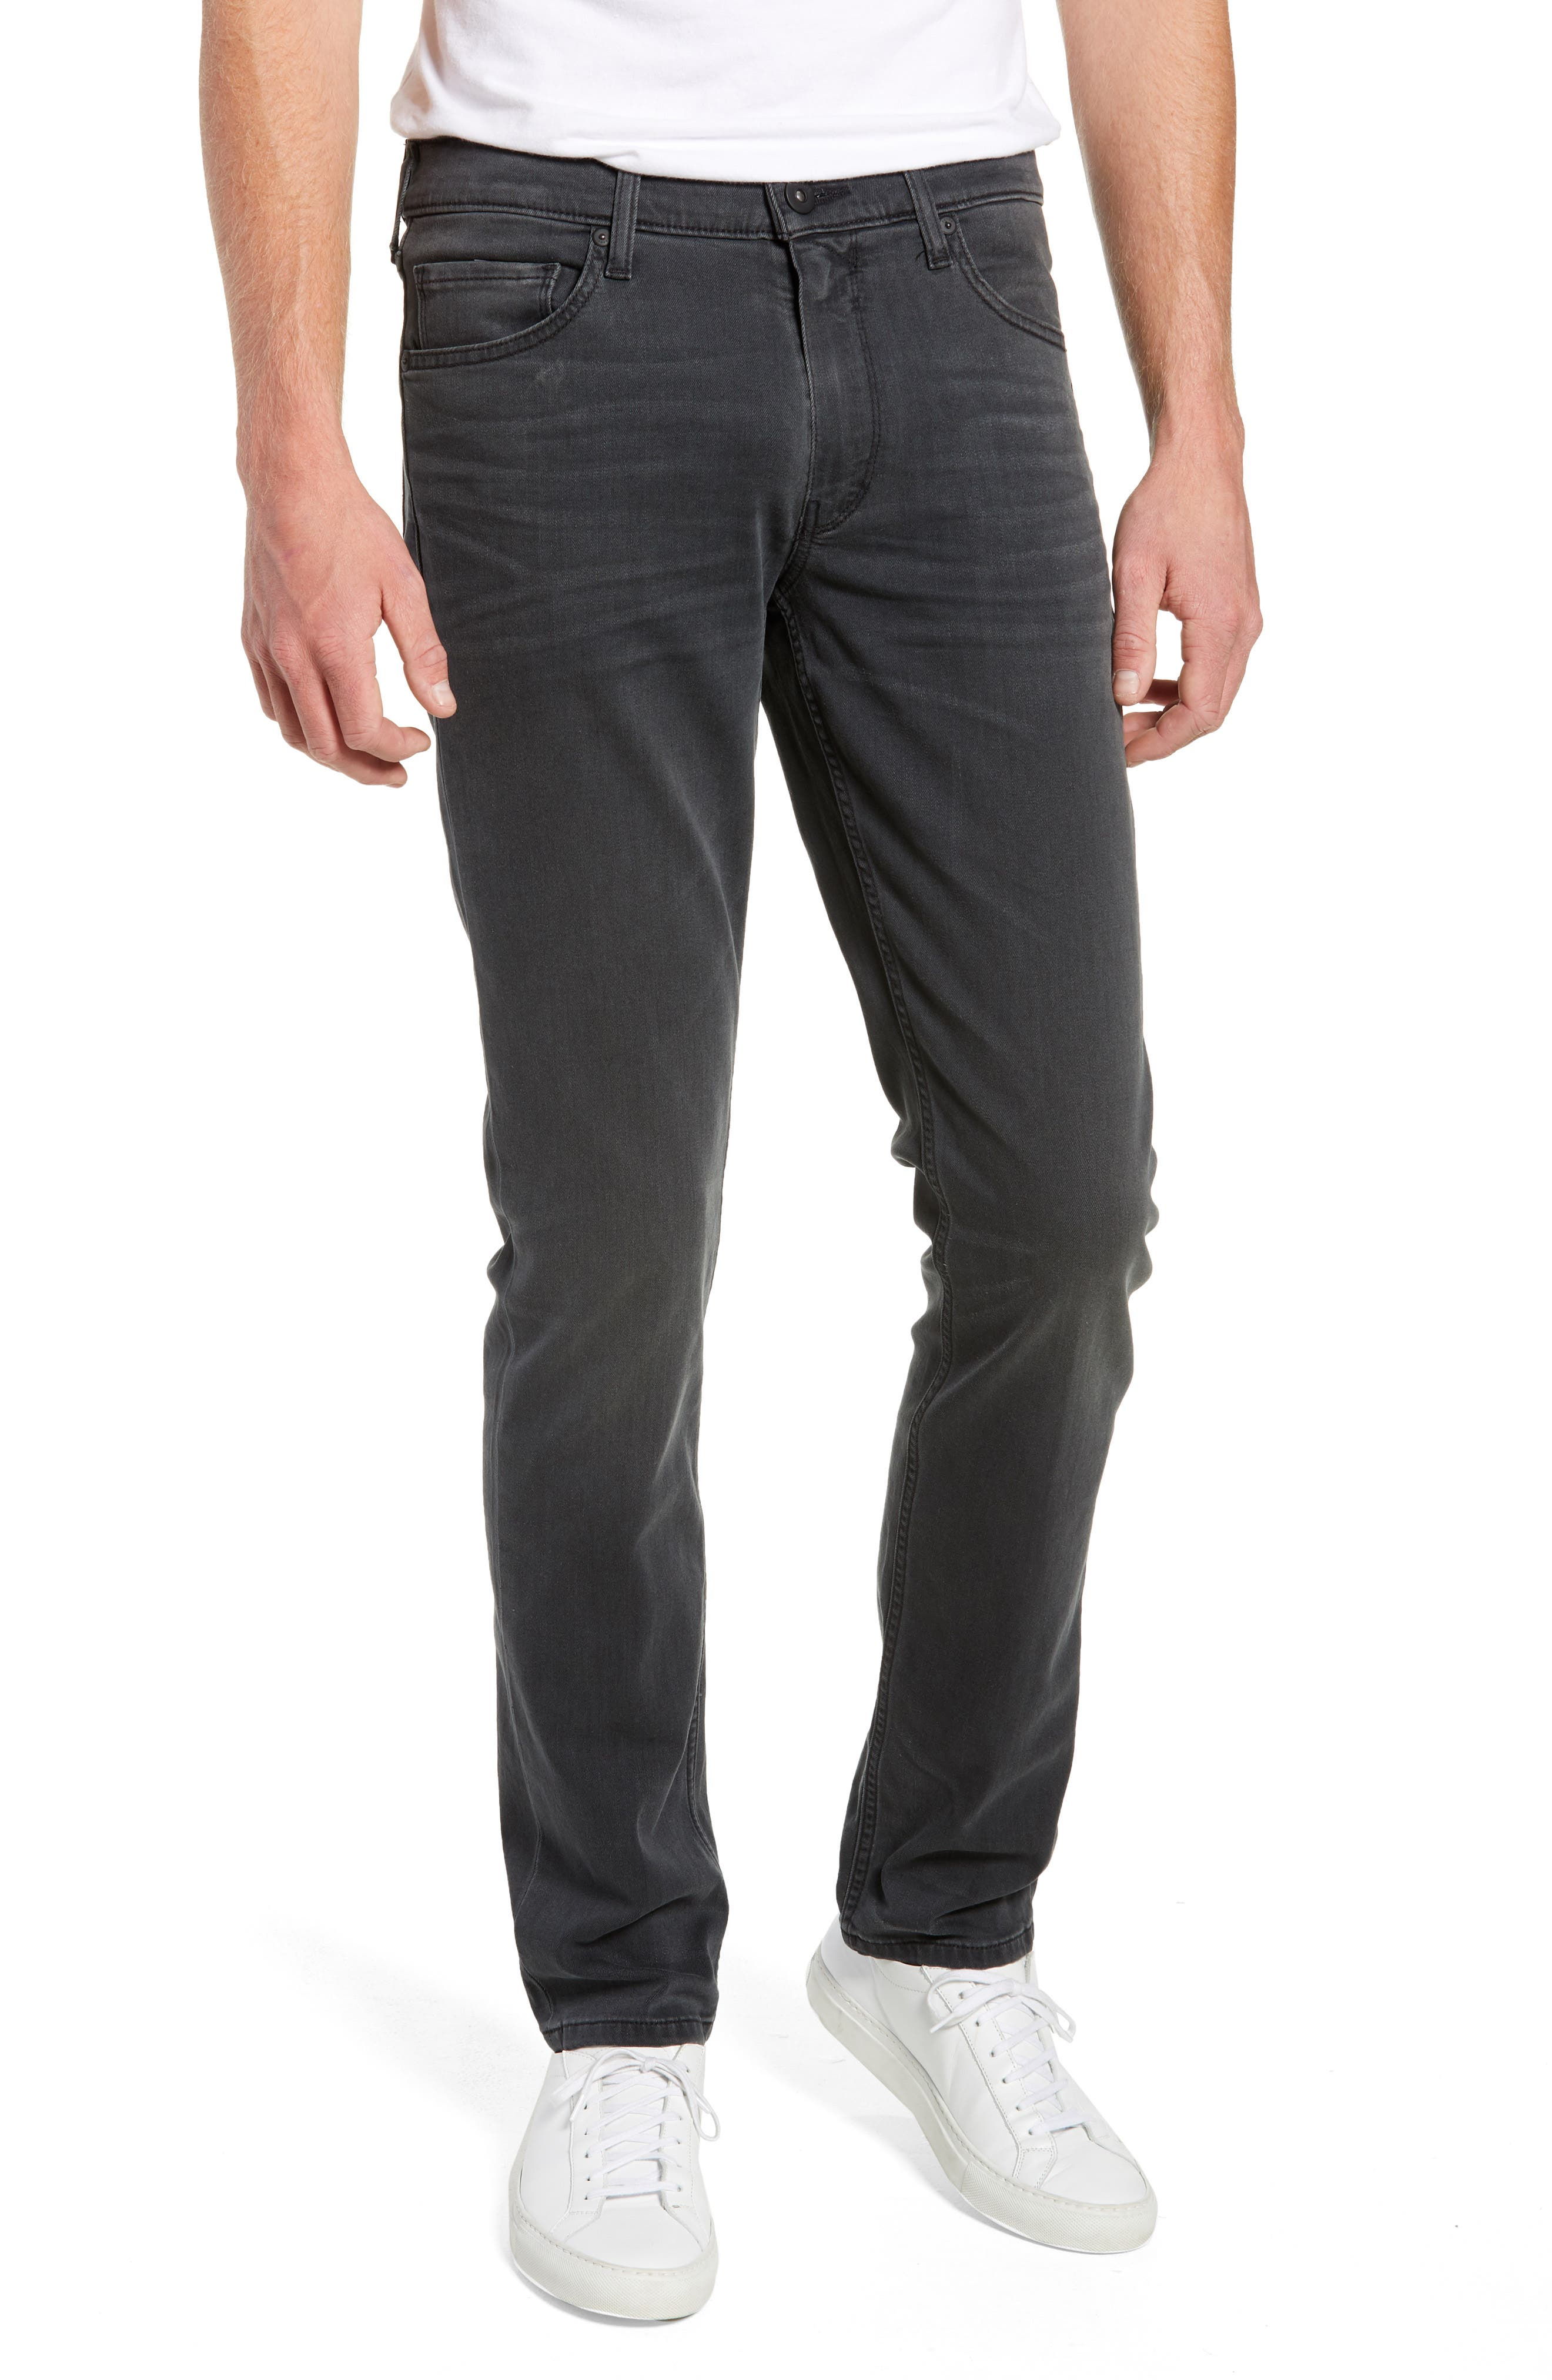 Transcend - Lennox Slim Fit Jeans,                         Main,                         color, SHELDON